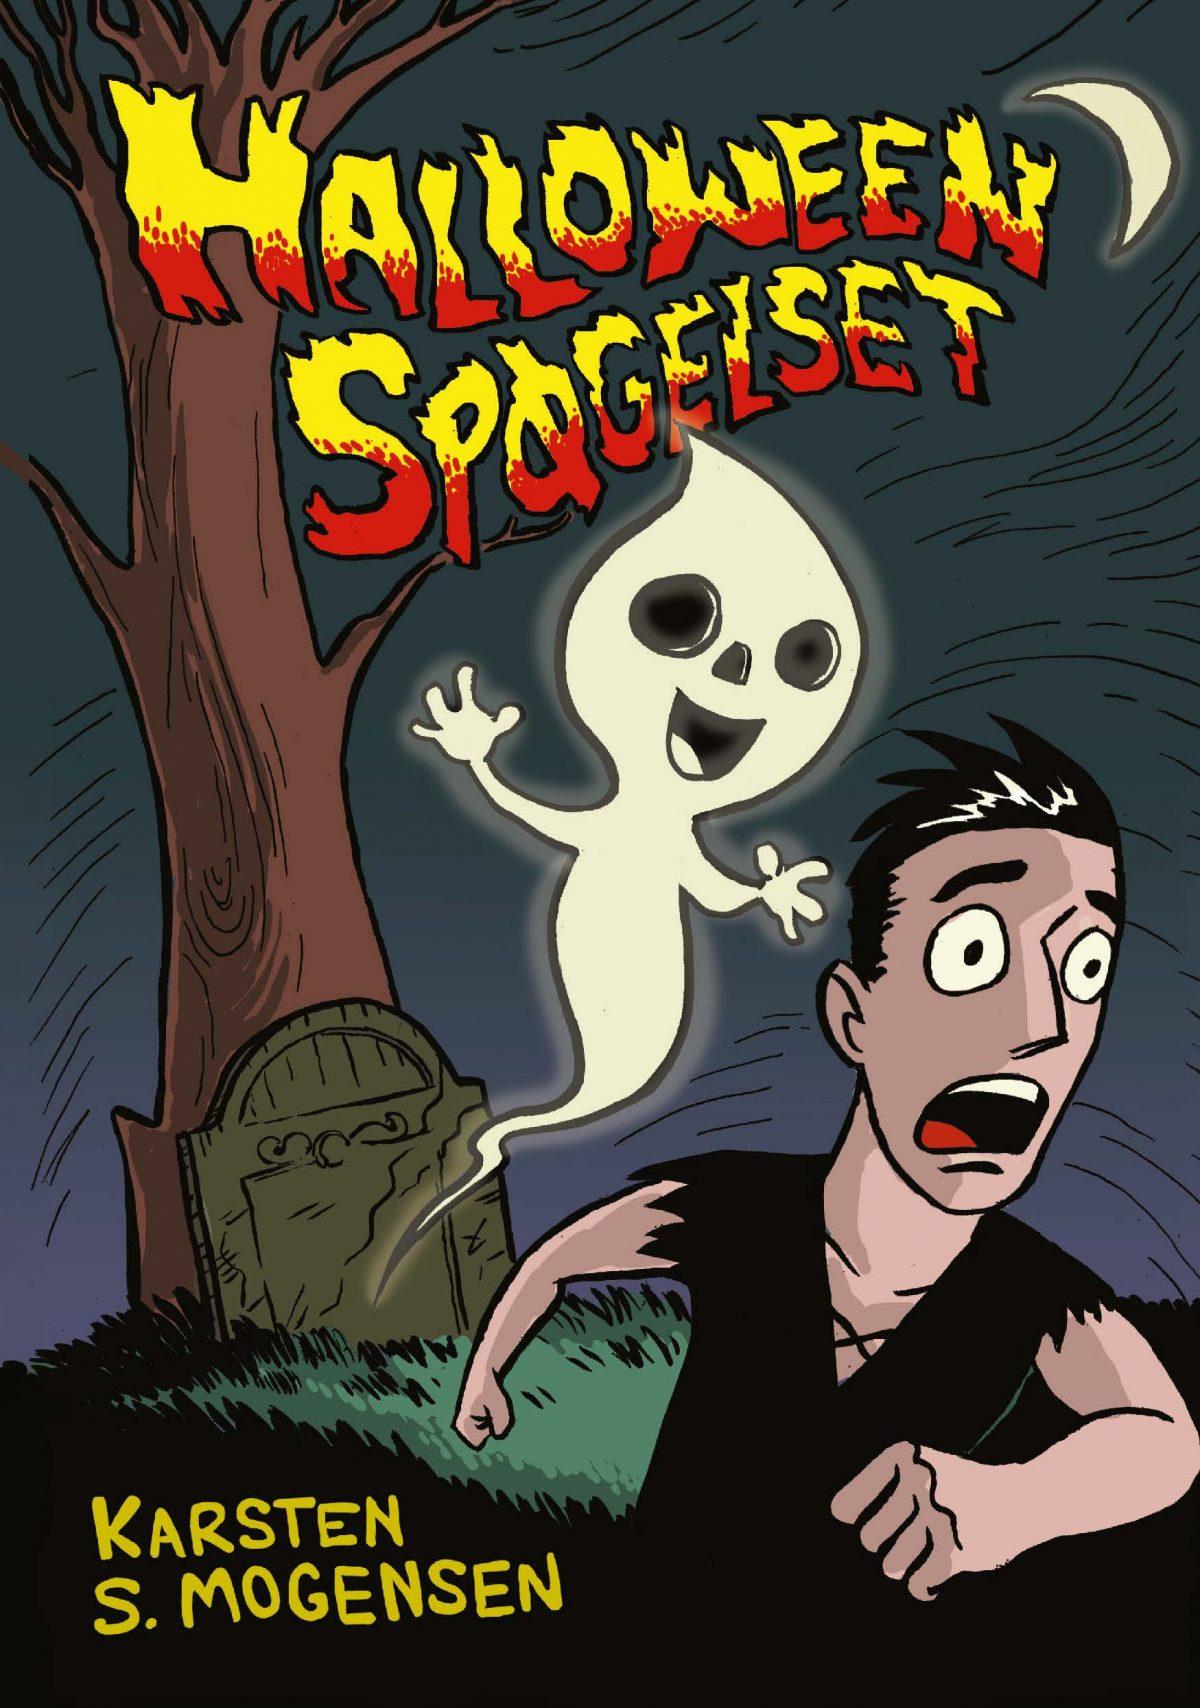 Halloween Spøgelset